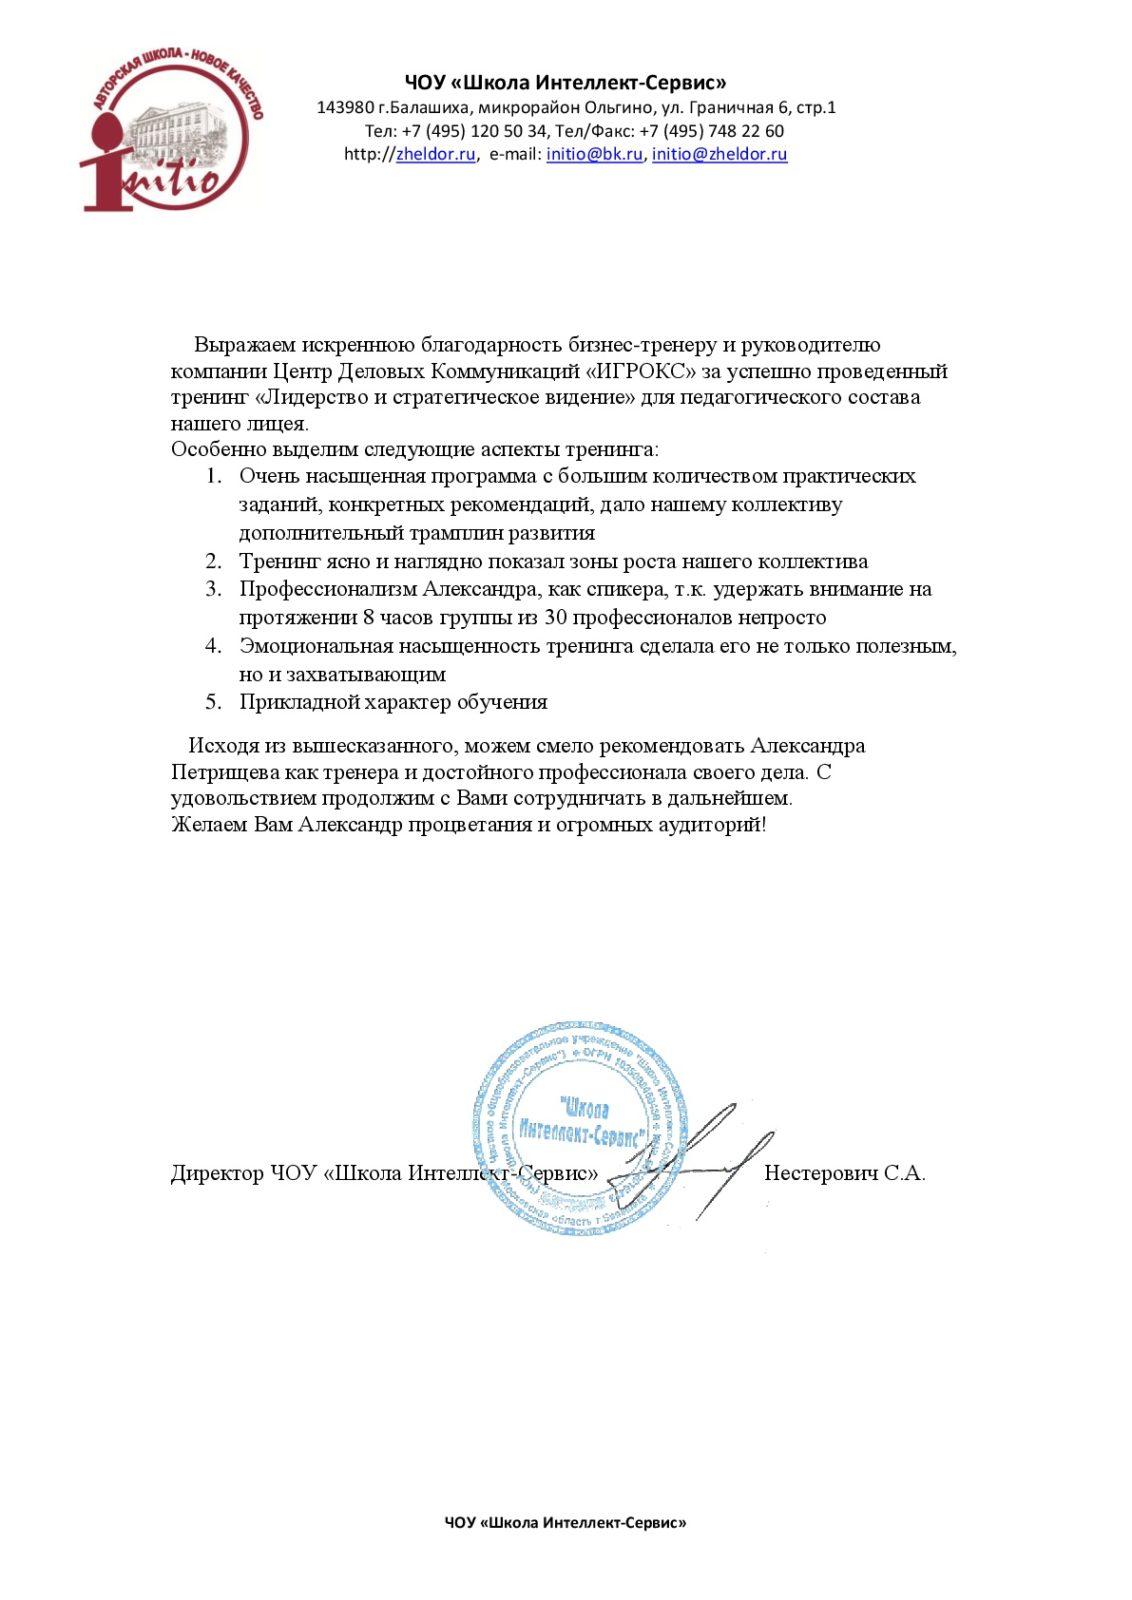 "ЧОУ «ШКОЛА ИНТЕЛЛЕКТ-СЕРВИС» & МБОУ ""ЛИЦЕЙ"""